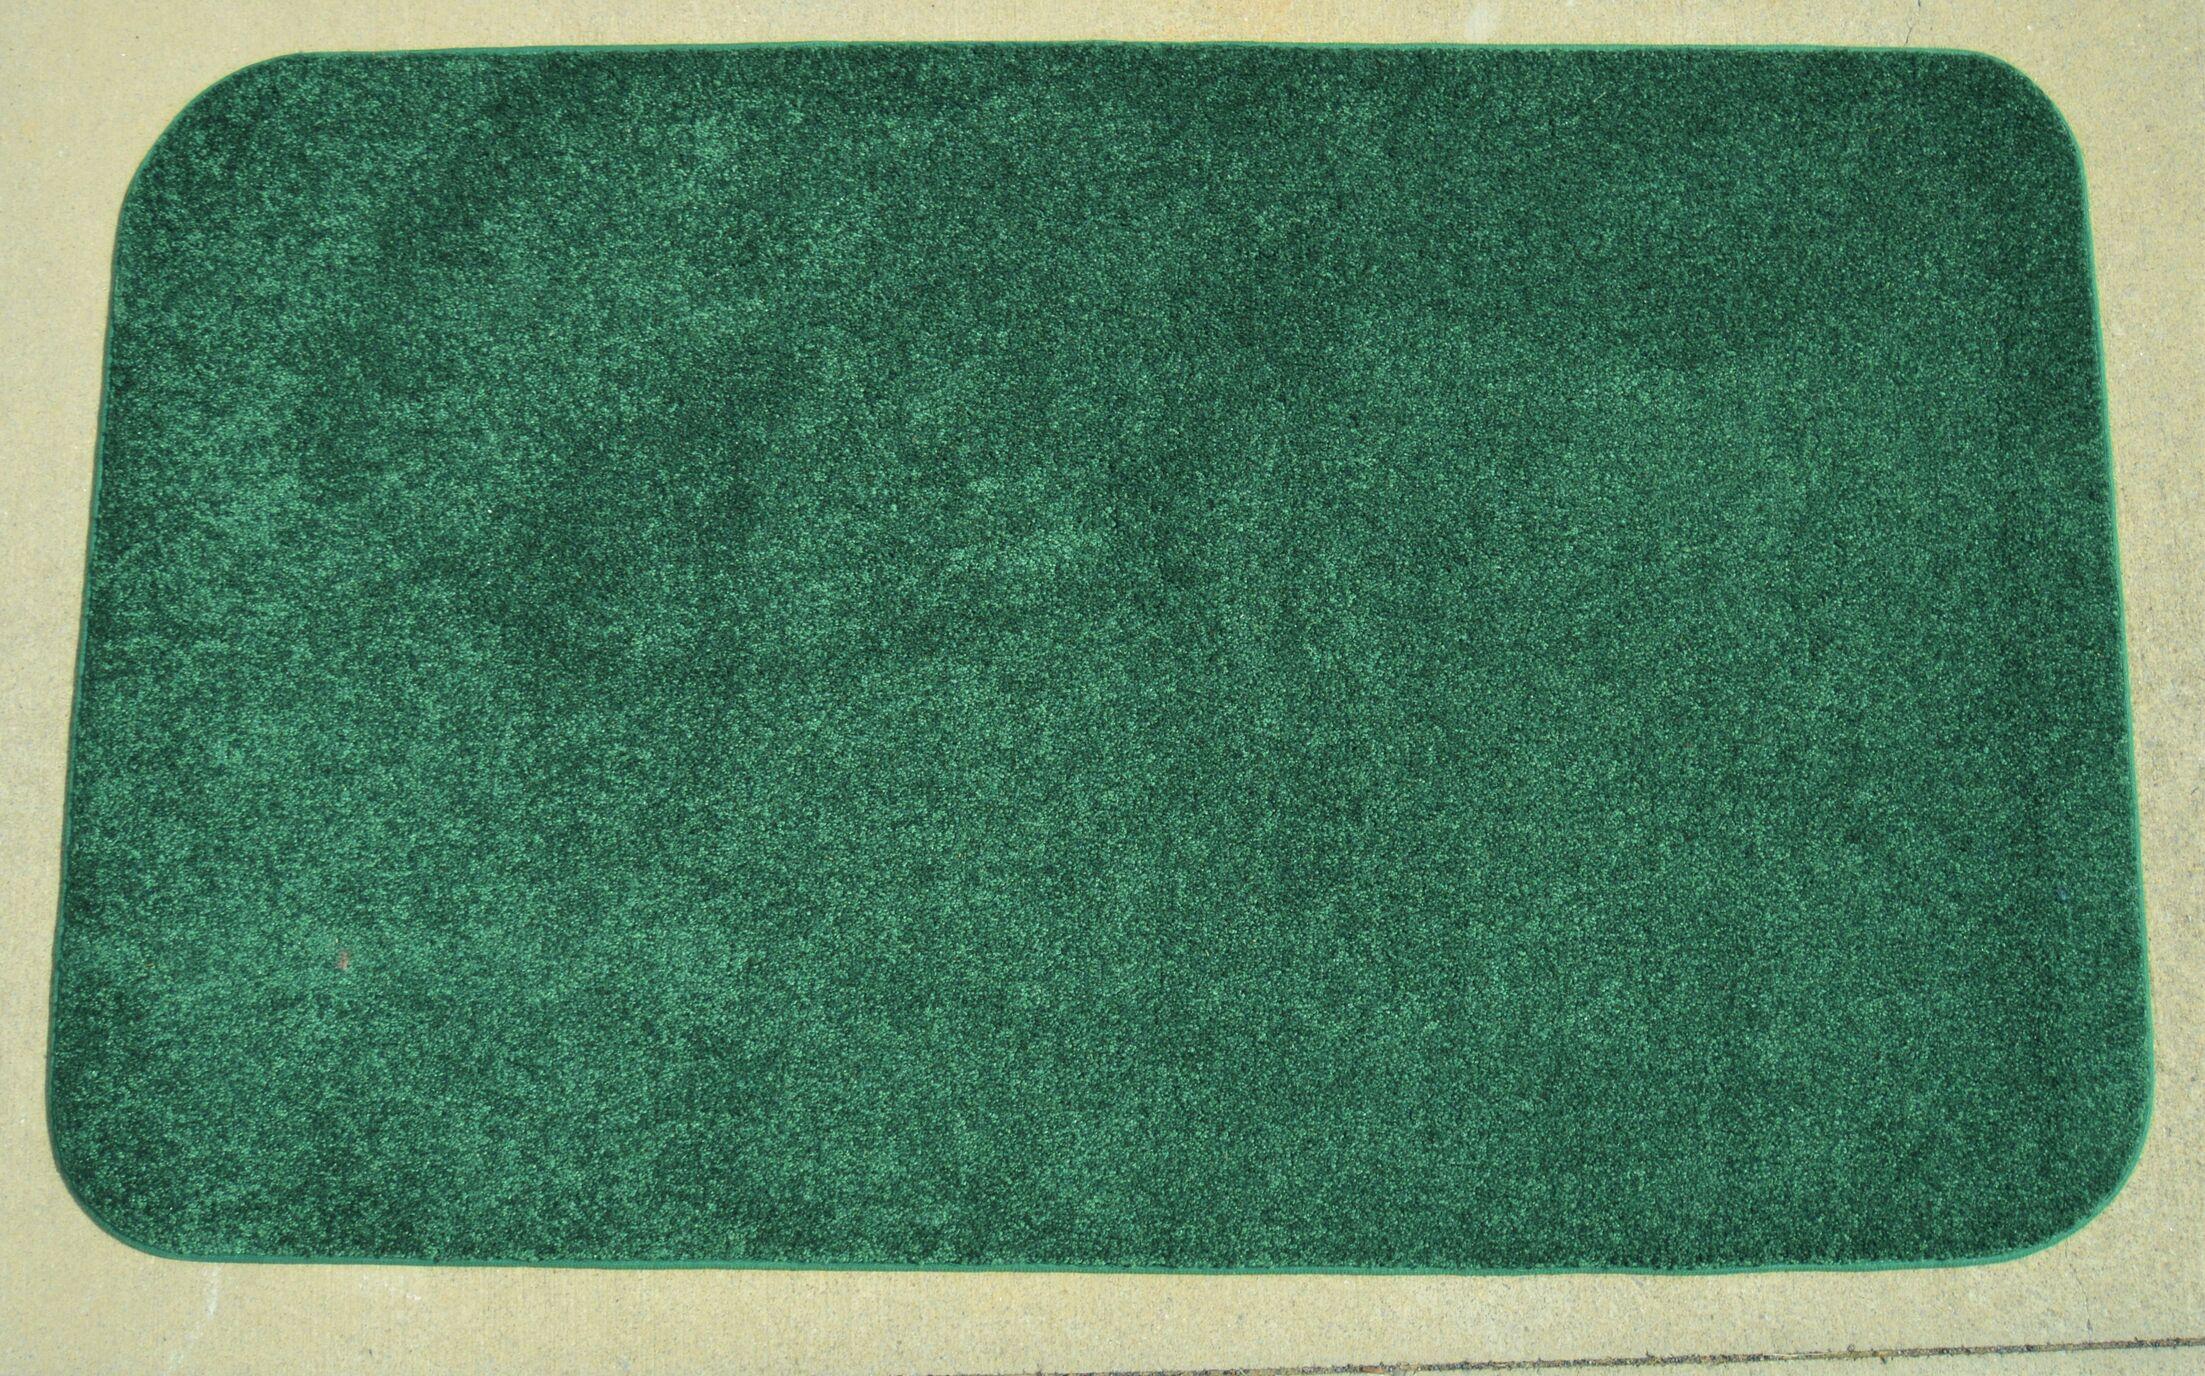 Makenna Polo Green Area Rug Rug Size: 6' x 9'